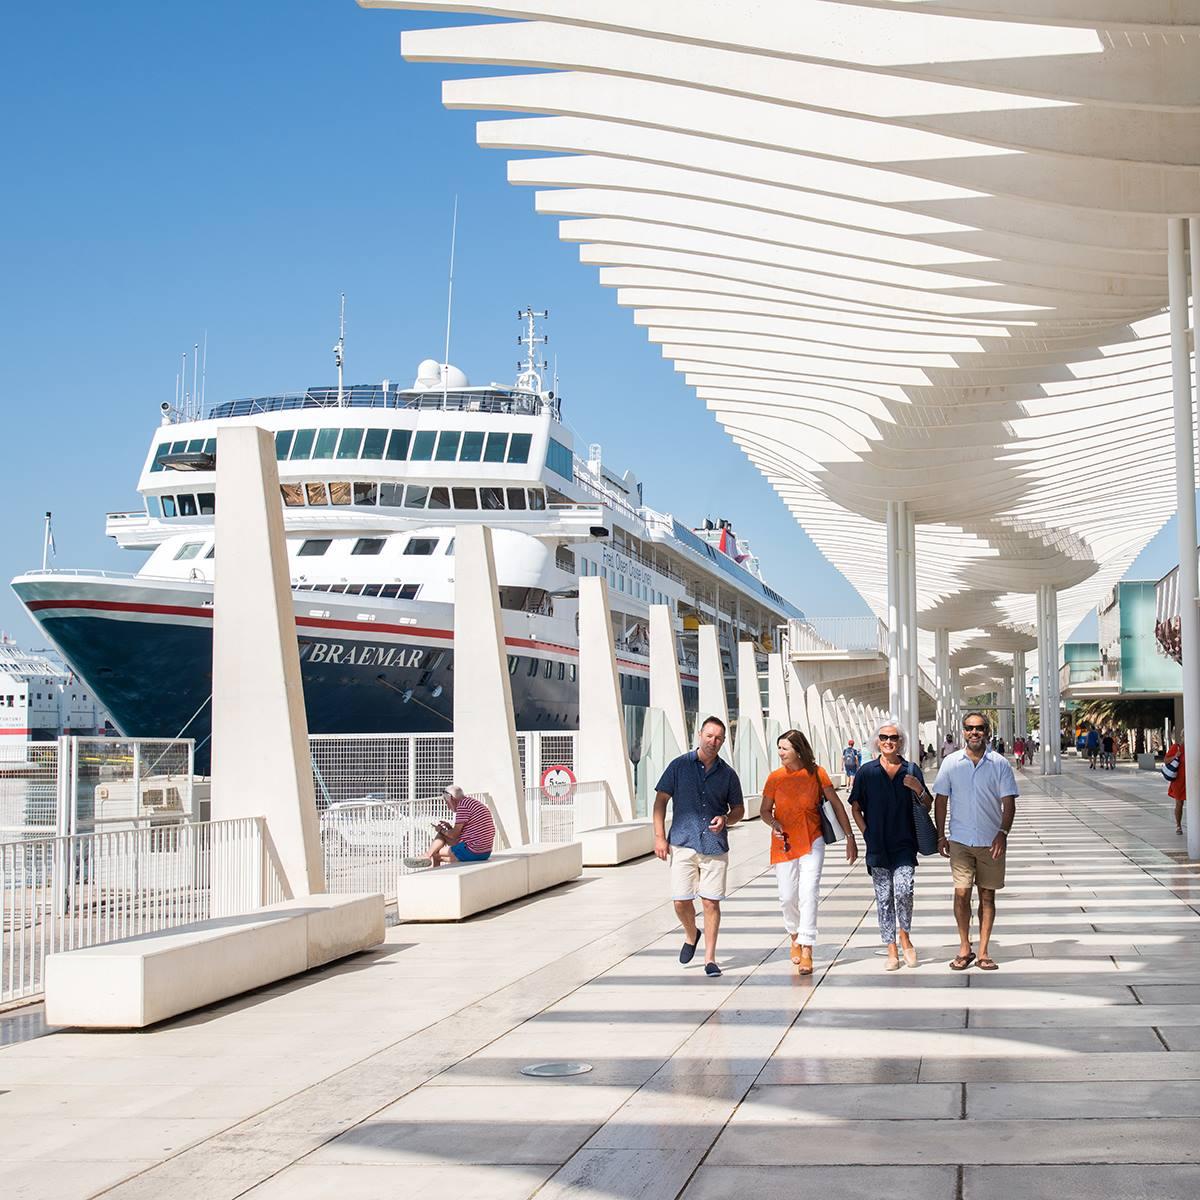 Braemar in Port